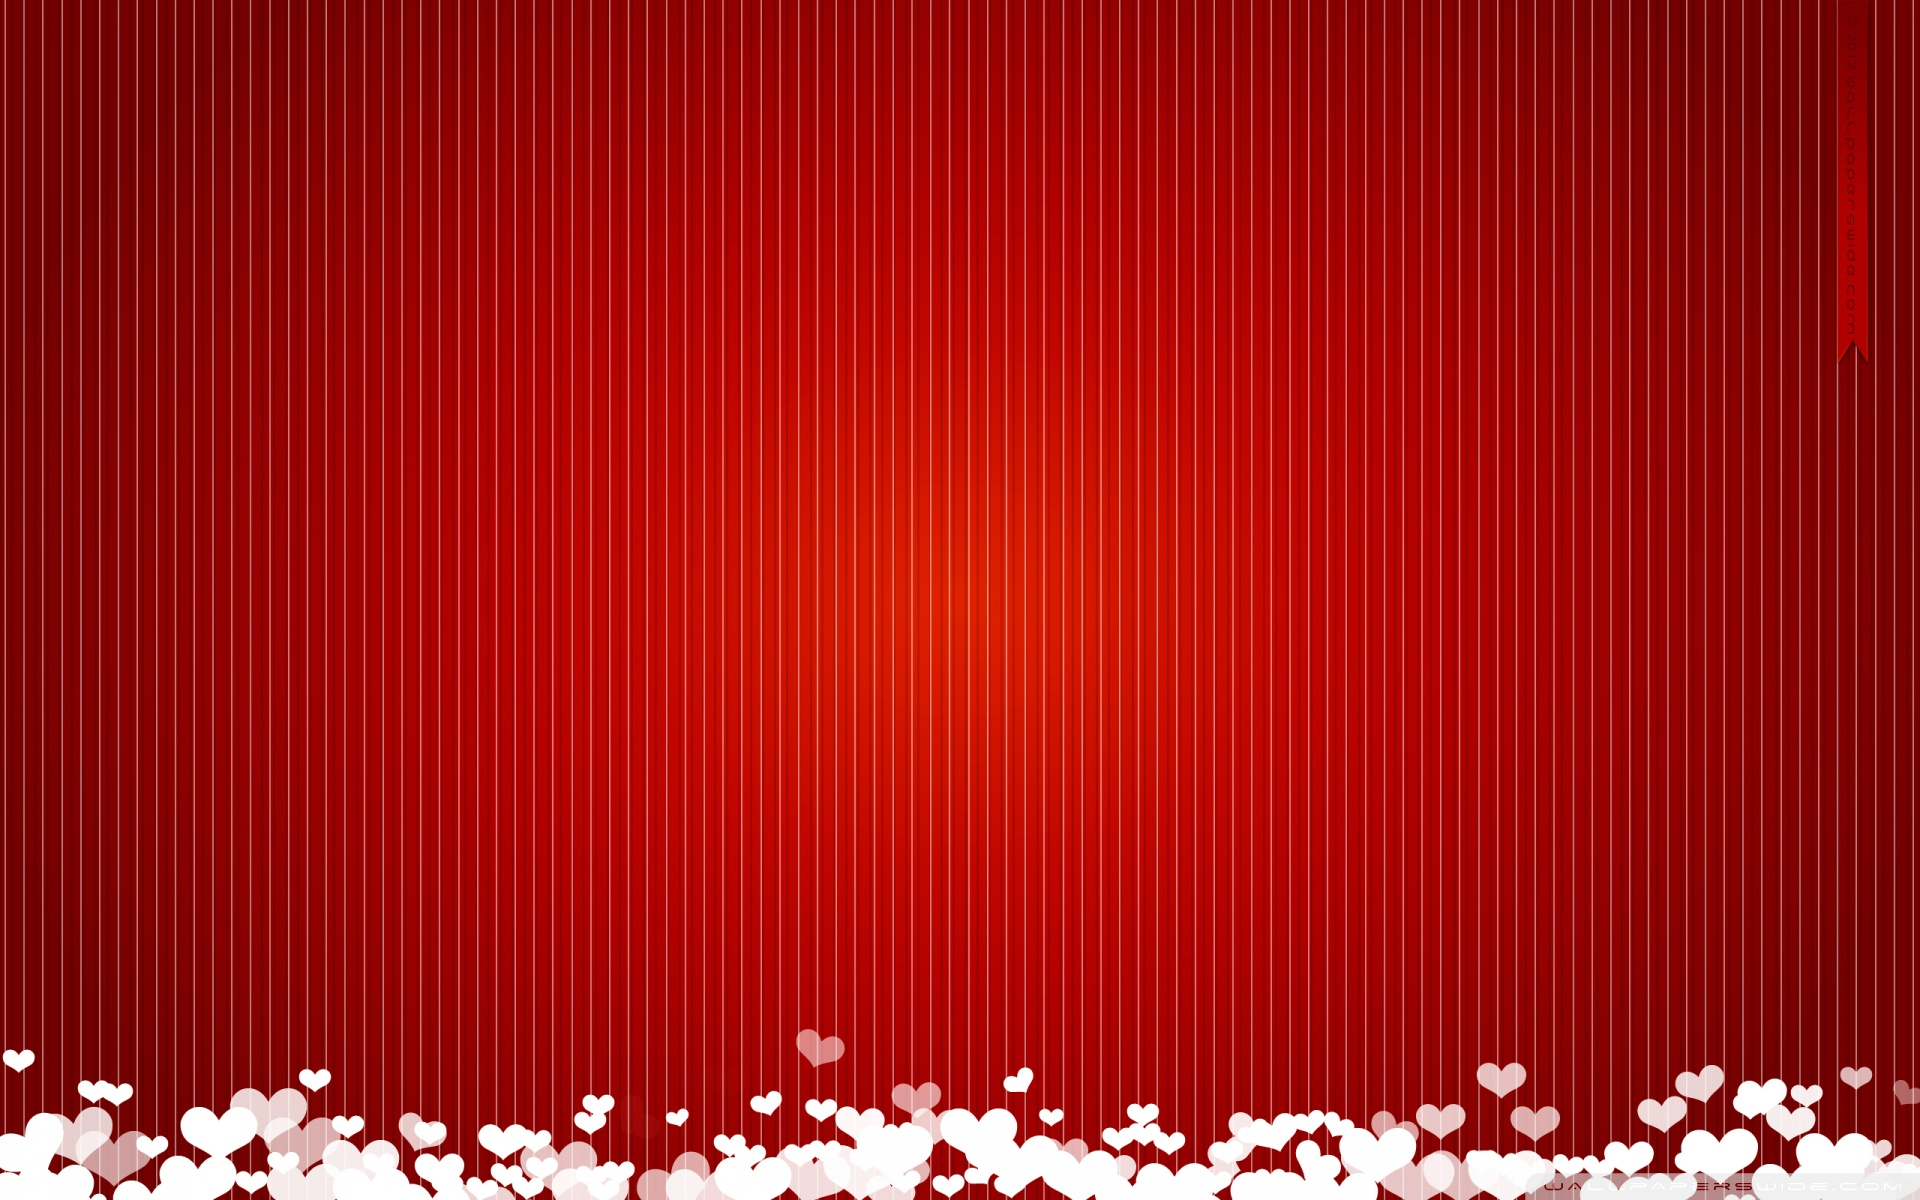 Love Wallpaper Red : Red Love Wallpapers - WallpaperSafari